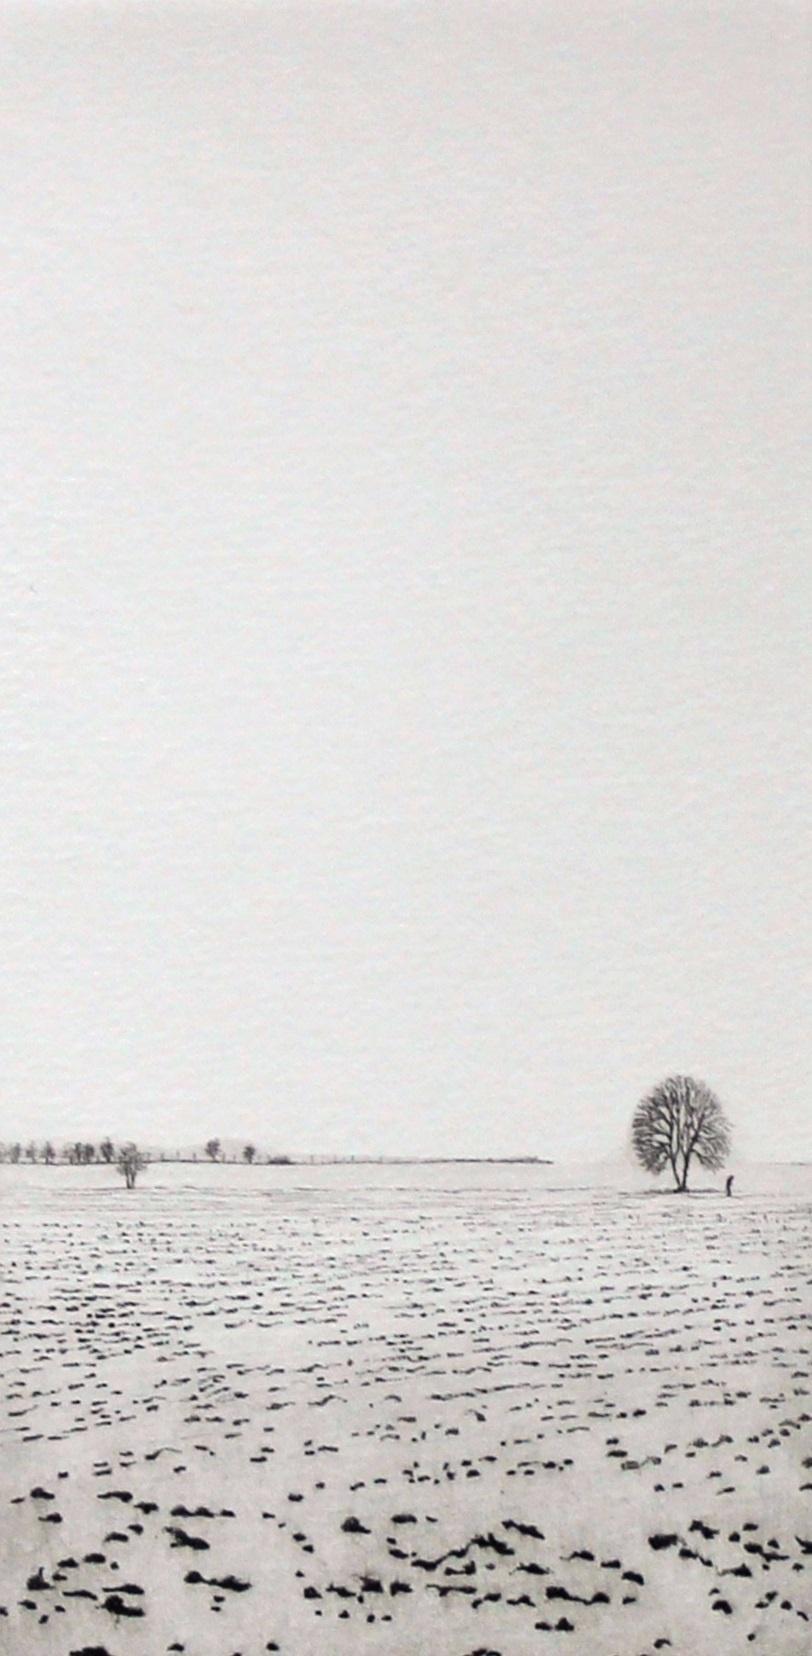 Moods III - XXI century, Landscape figurative print, Black and white